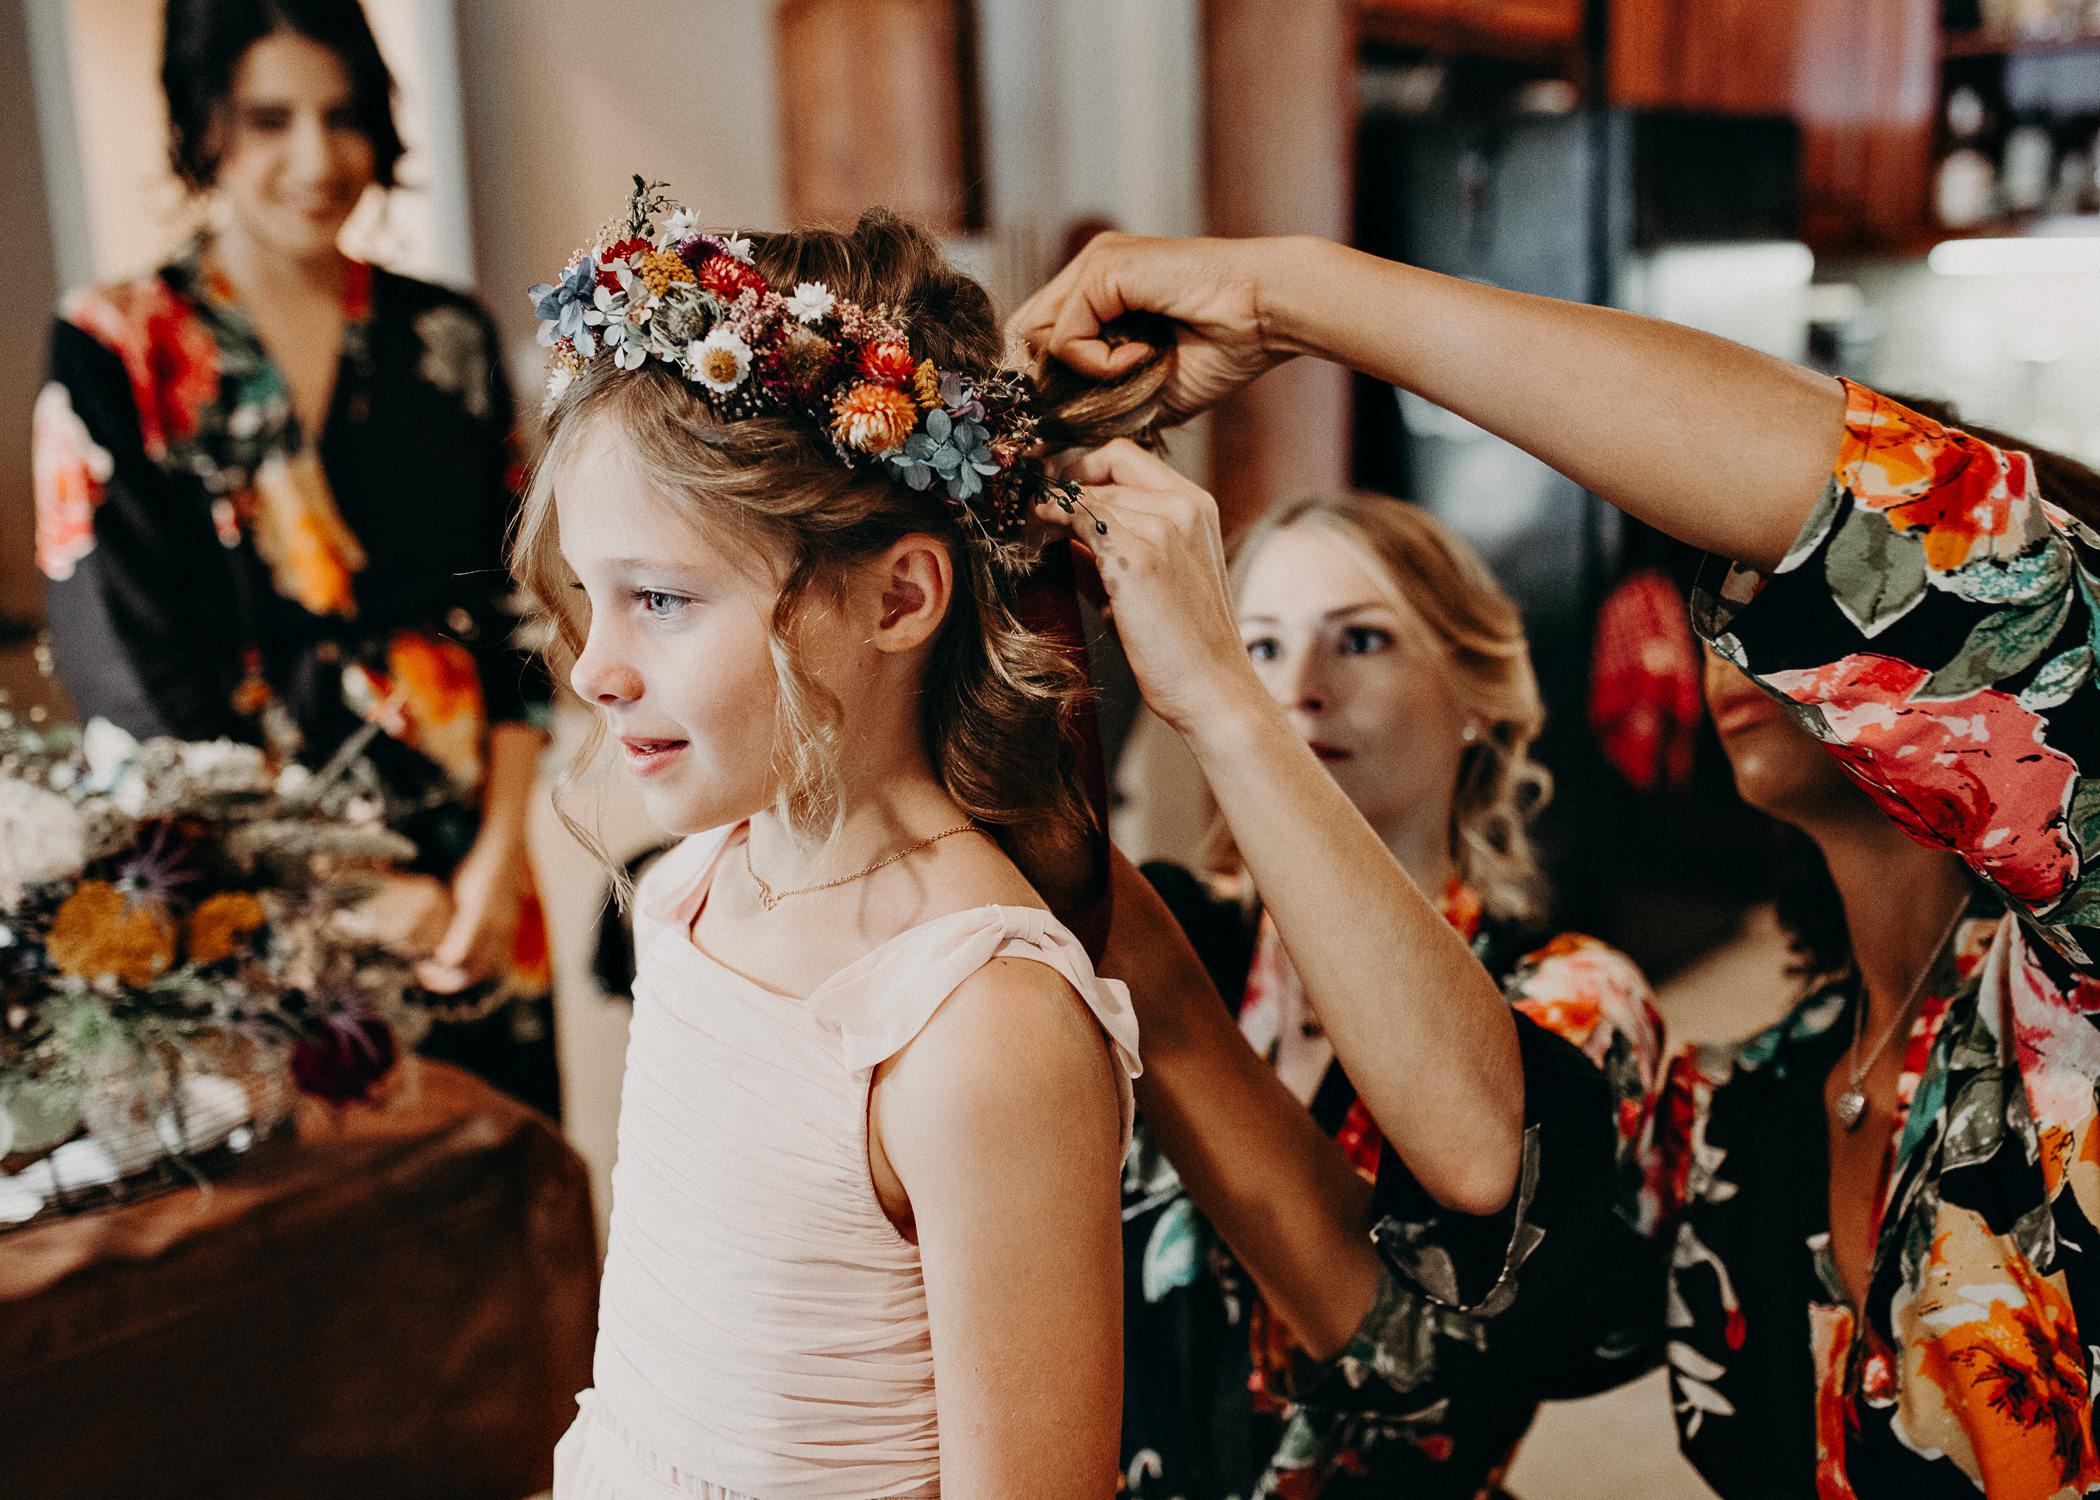 12 Junior Bridesmaid and bride getting ready pictures, Atlanta-Ga Photographer .jpg